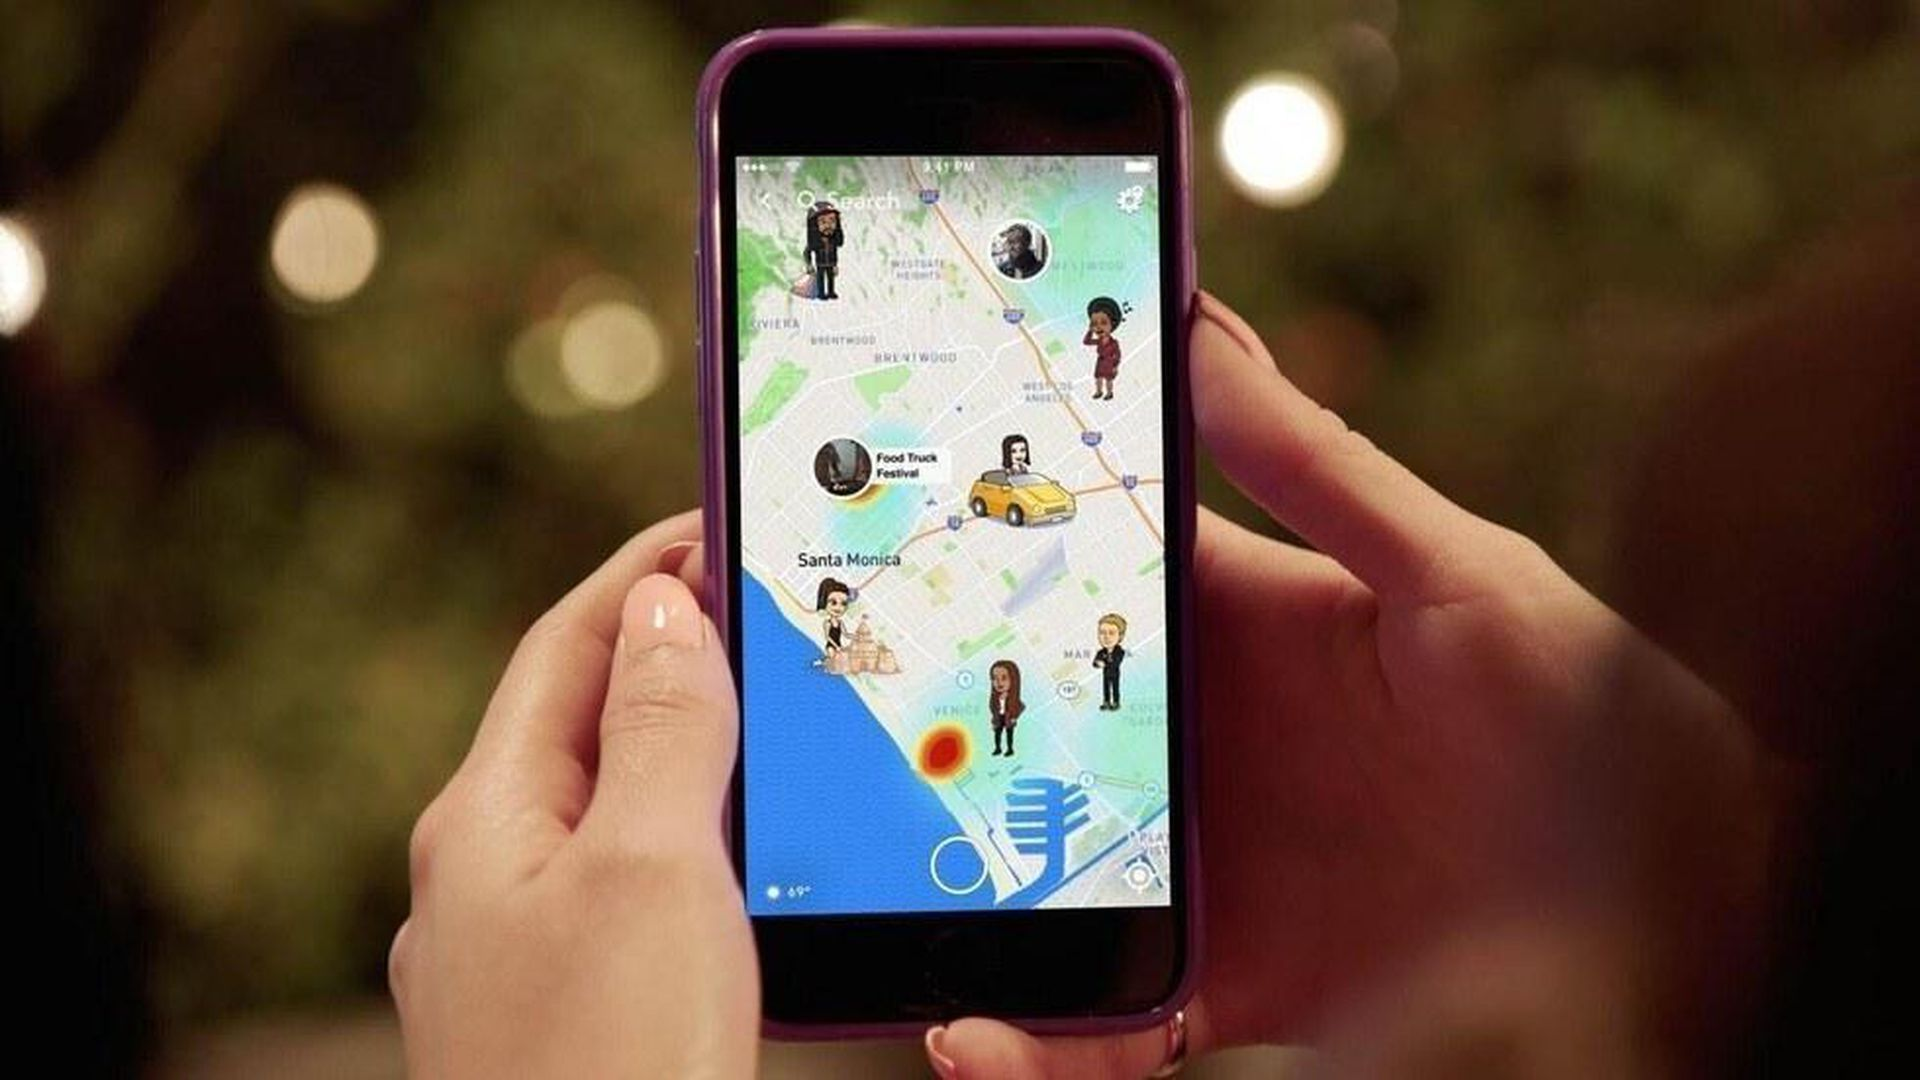 Mapbox-powered Snap Maps